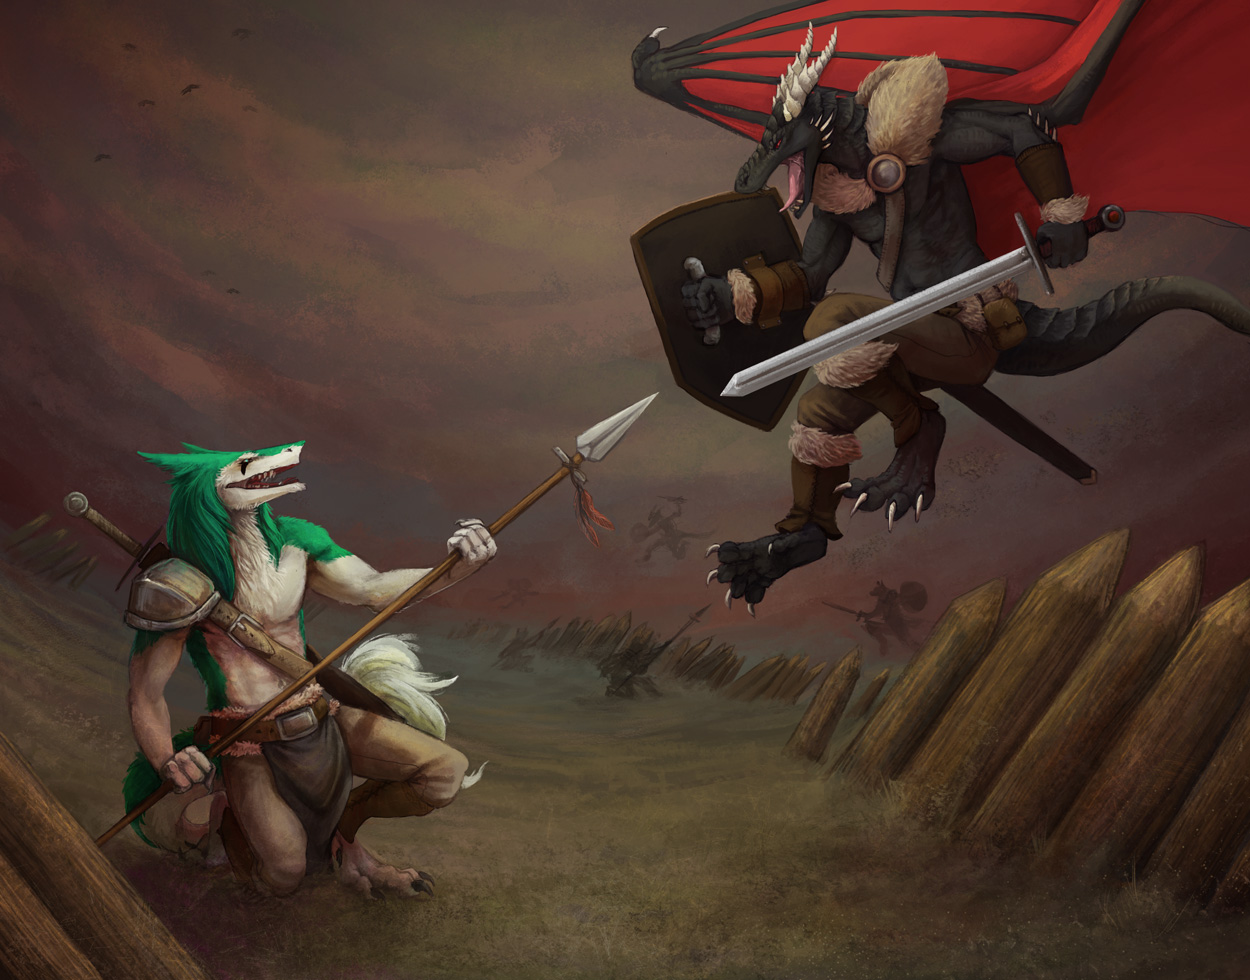 Into Battle! by Kampfkewob